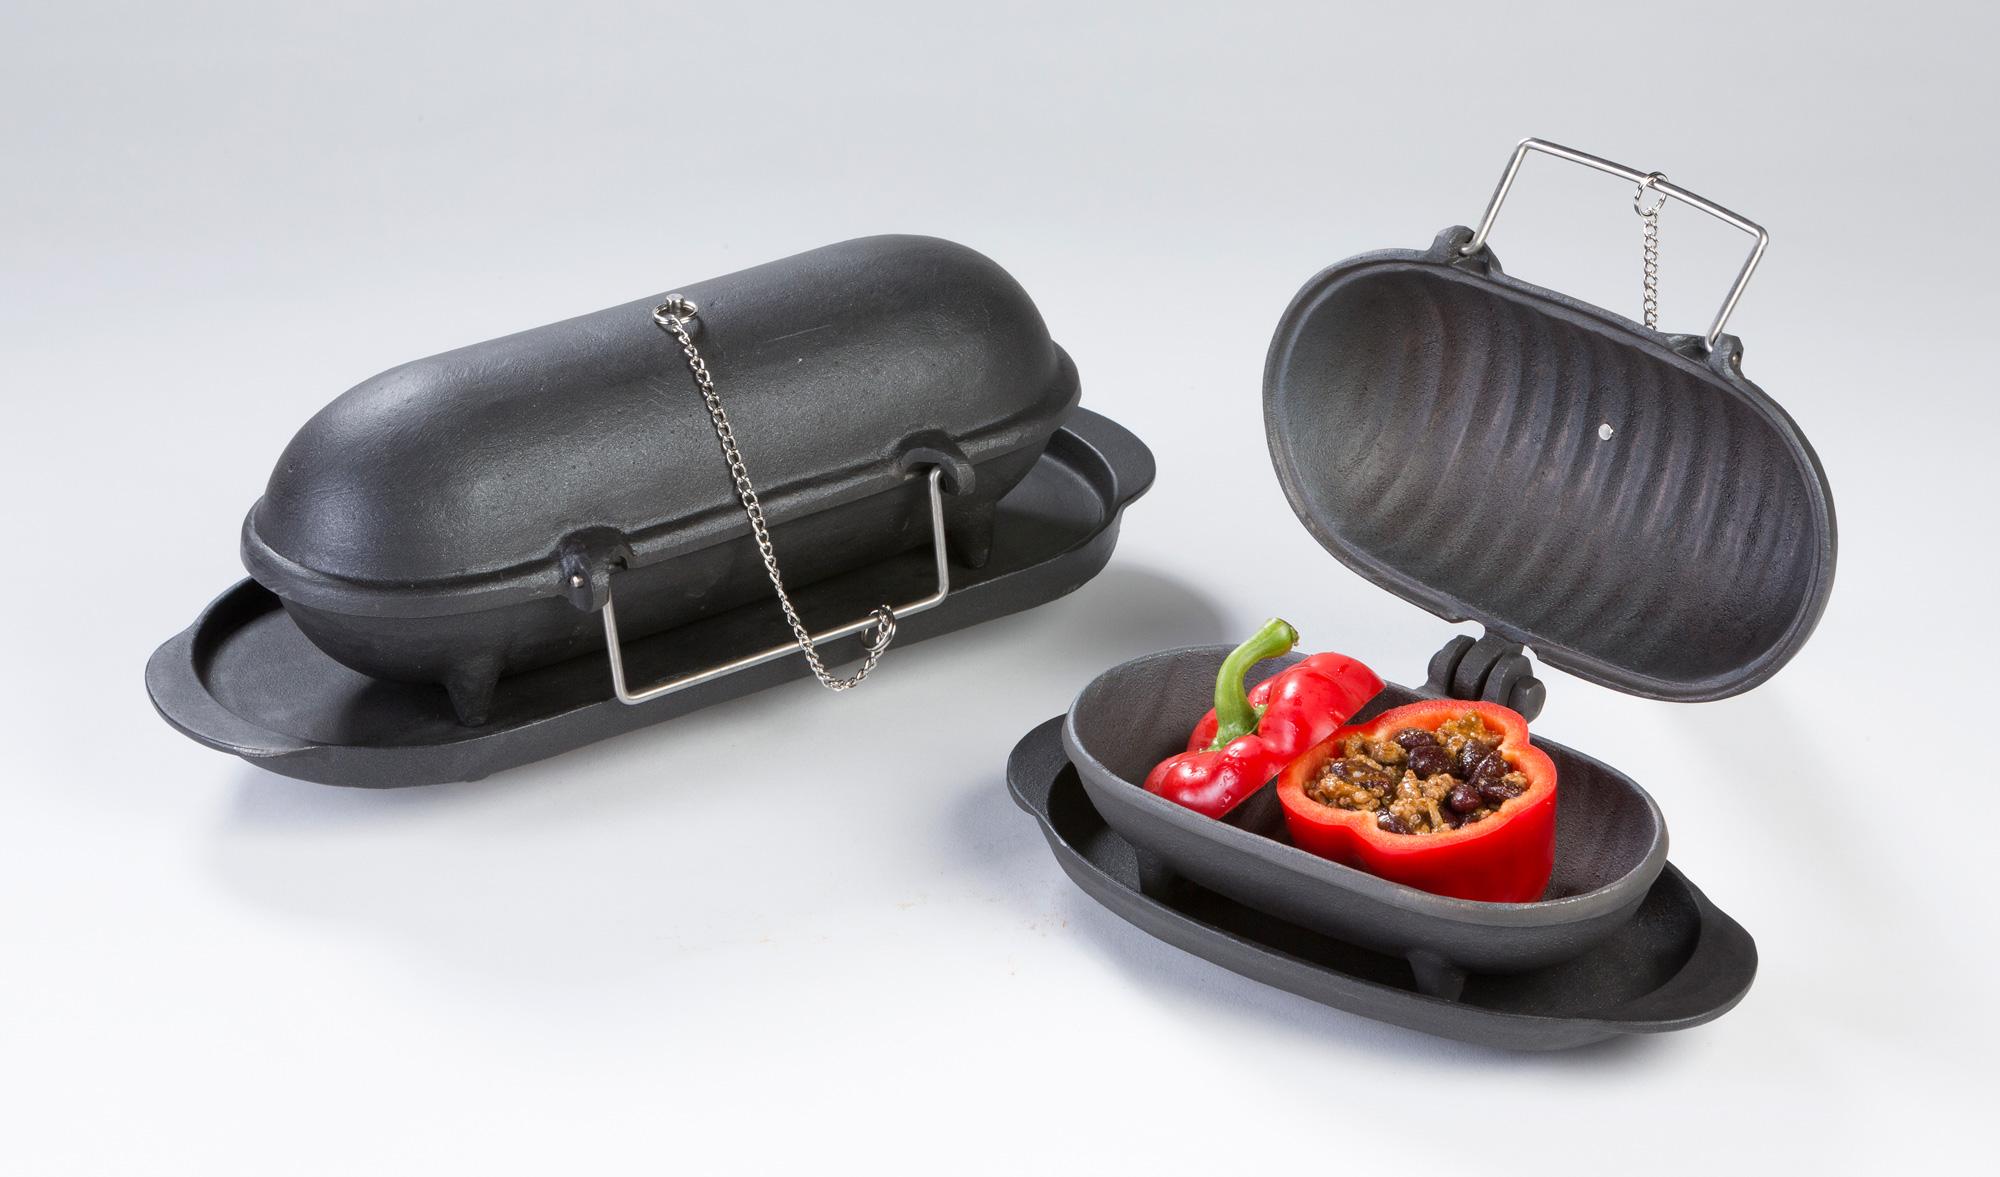 Gusseisen Back/Kochaufsatz Thera Fine cooker L Globe-fire 30x10x12cm Bild 3